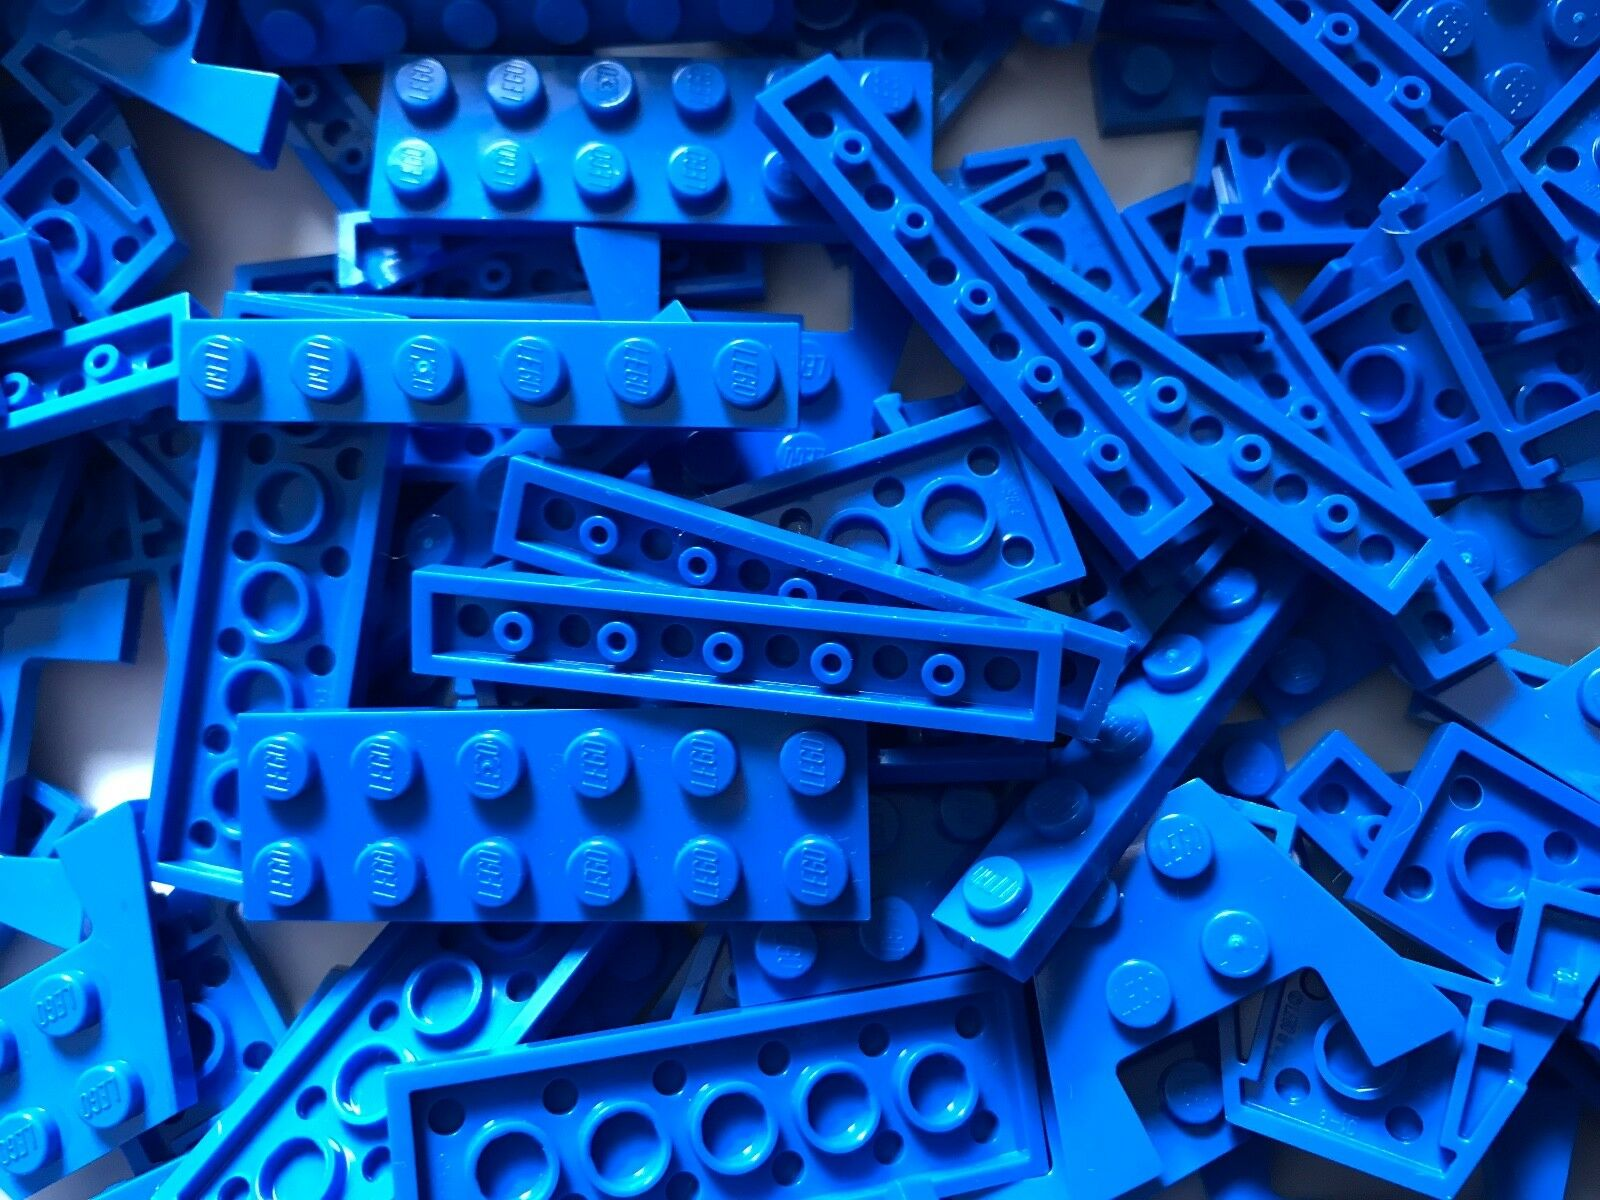 700g LEGO PARTS Blau plates lot STAR WARS CITY CITY CITY BATMAN MARVEL modified parts 5fc993